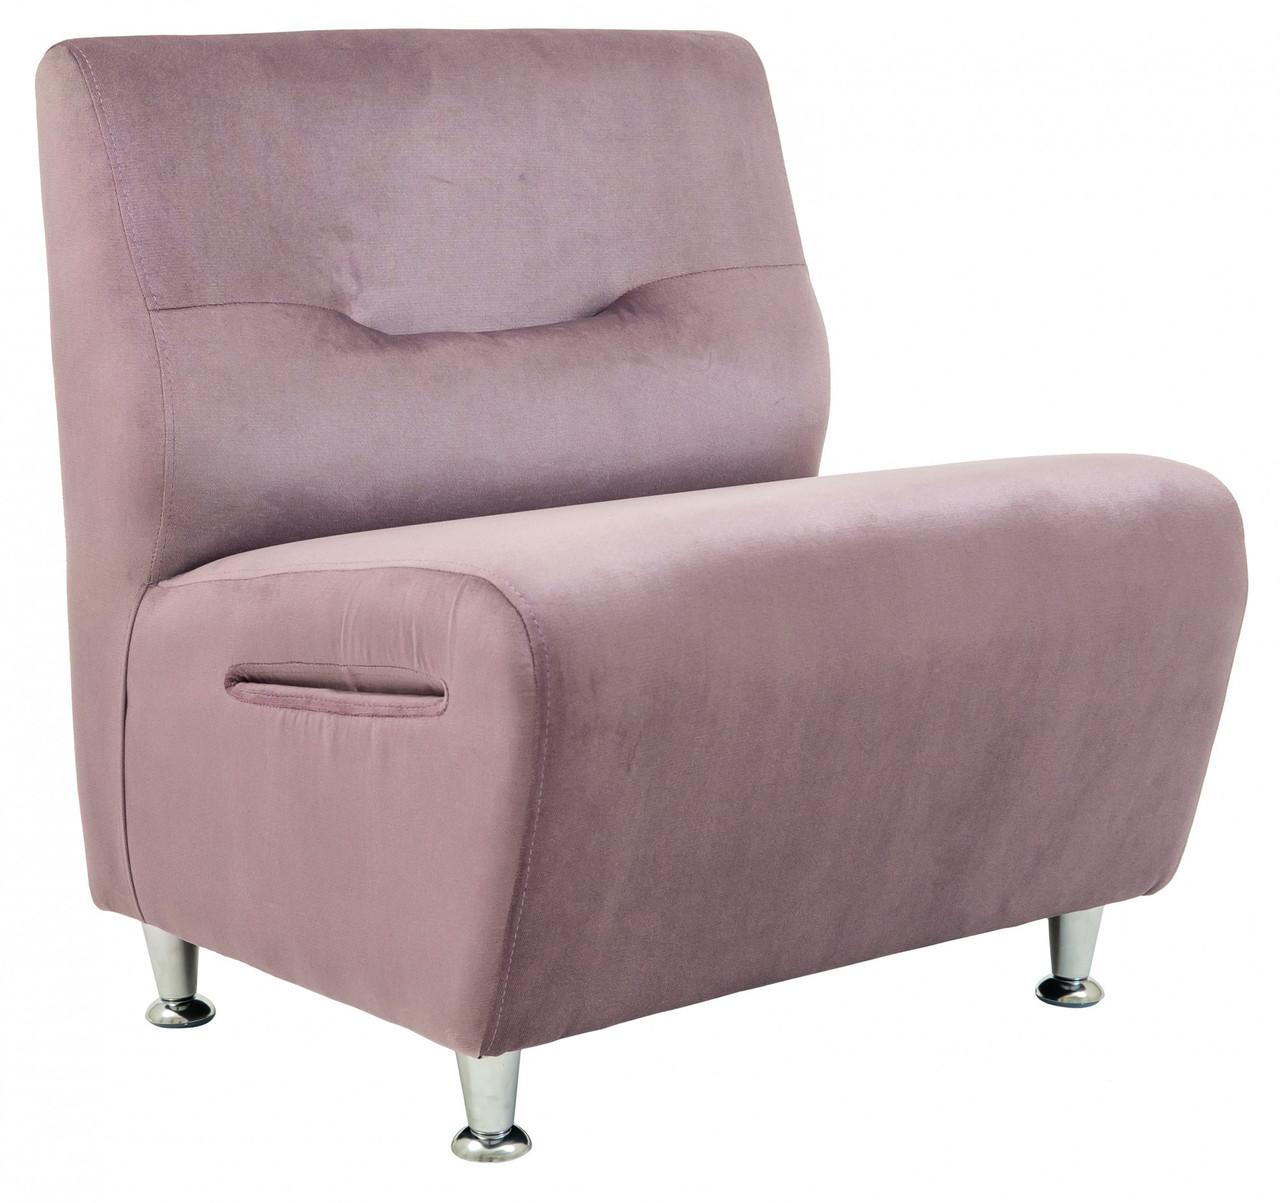 Кресло Richman Смарт 63 x 60 x 70H Missoni 21 Сиреневое